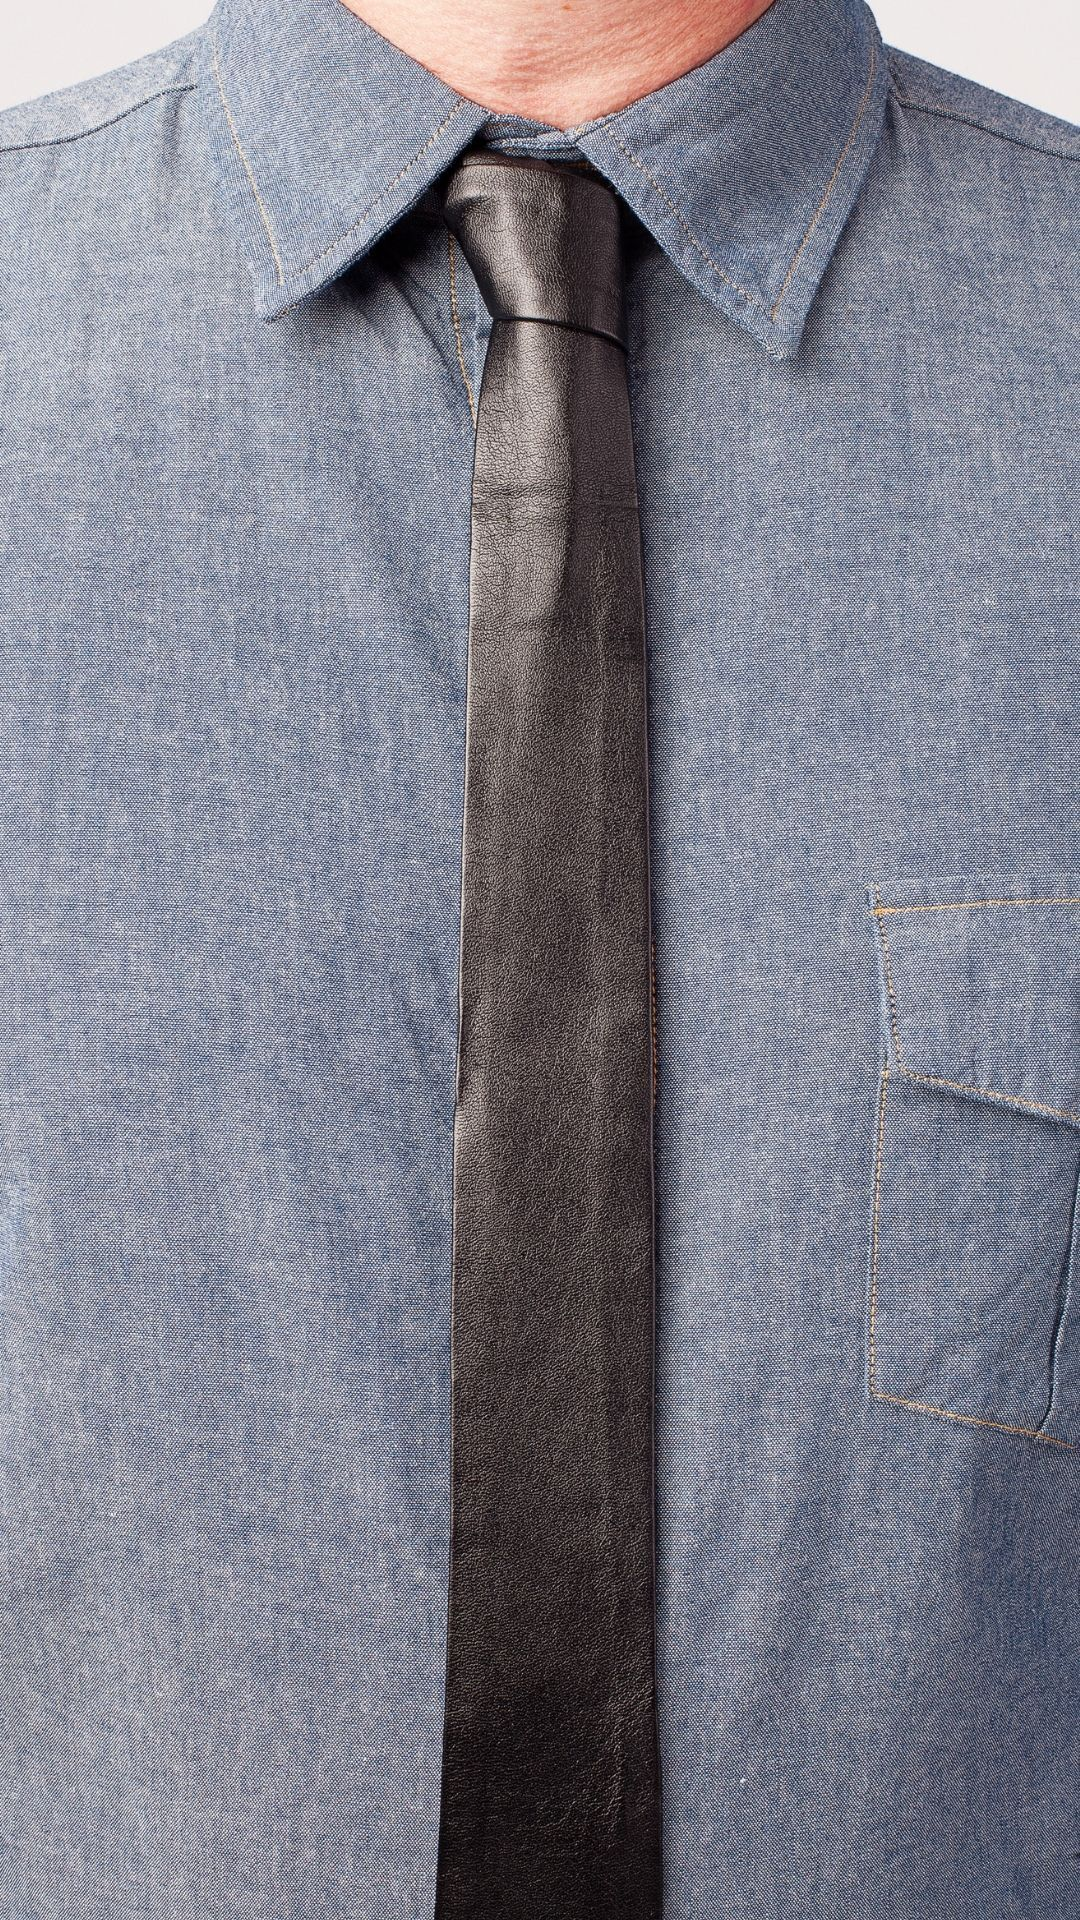 ajustar gravata